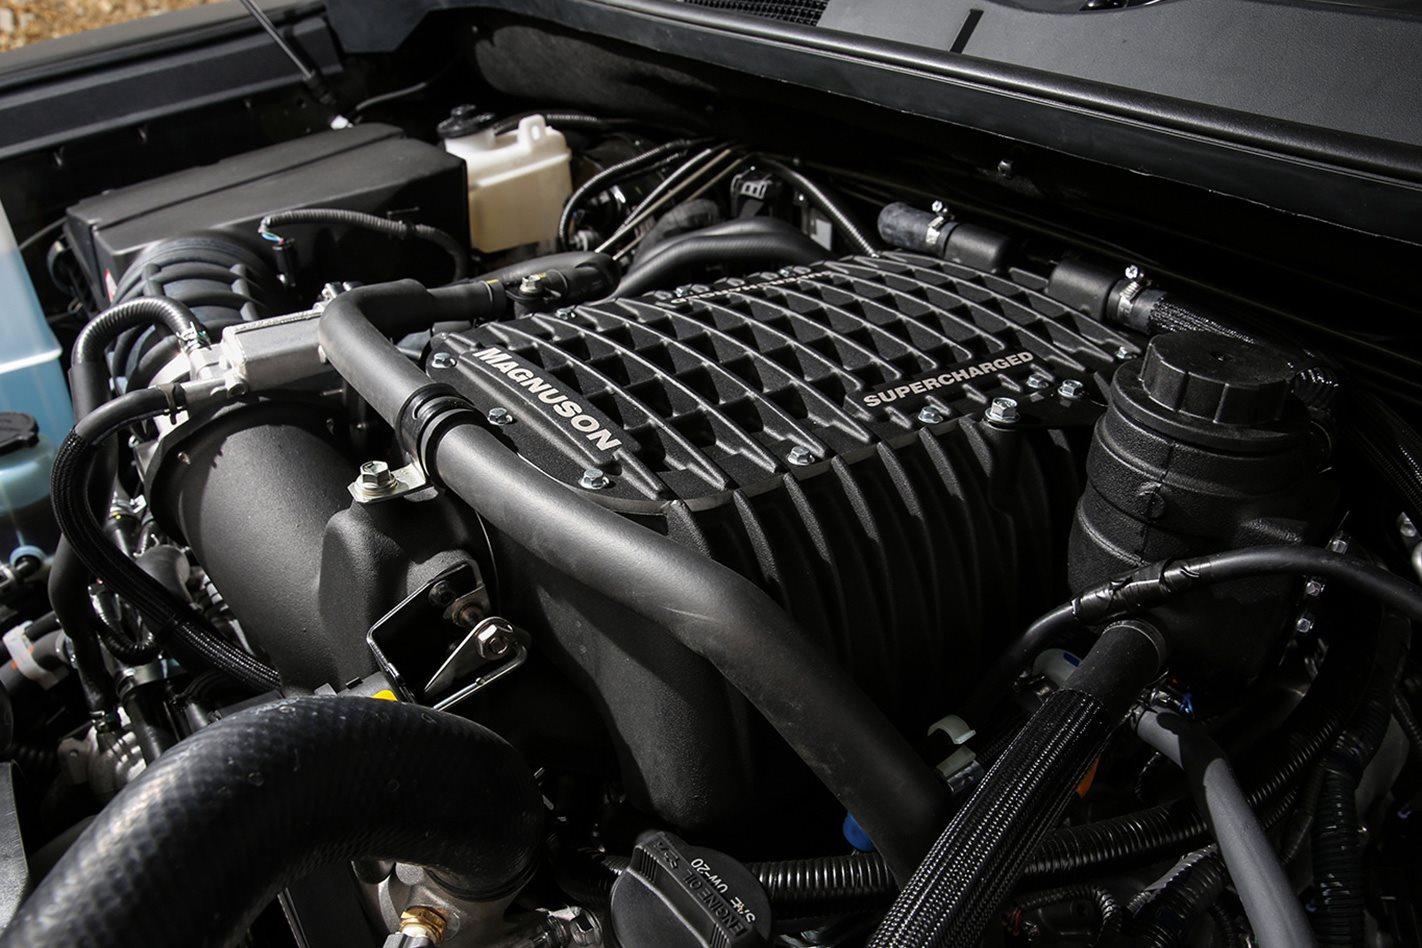 Toyota-TRD-Tundra-engine.jpg